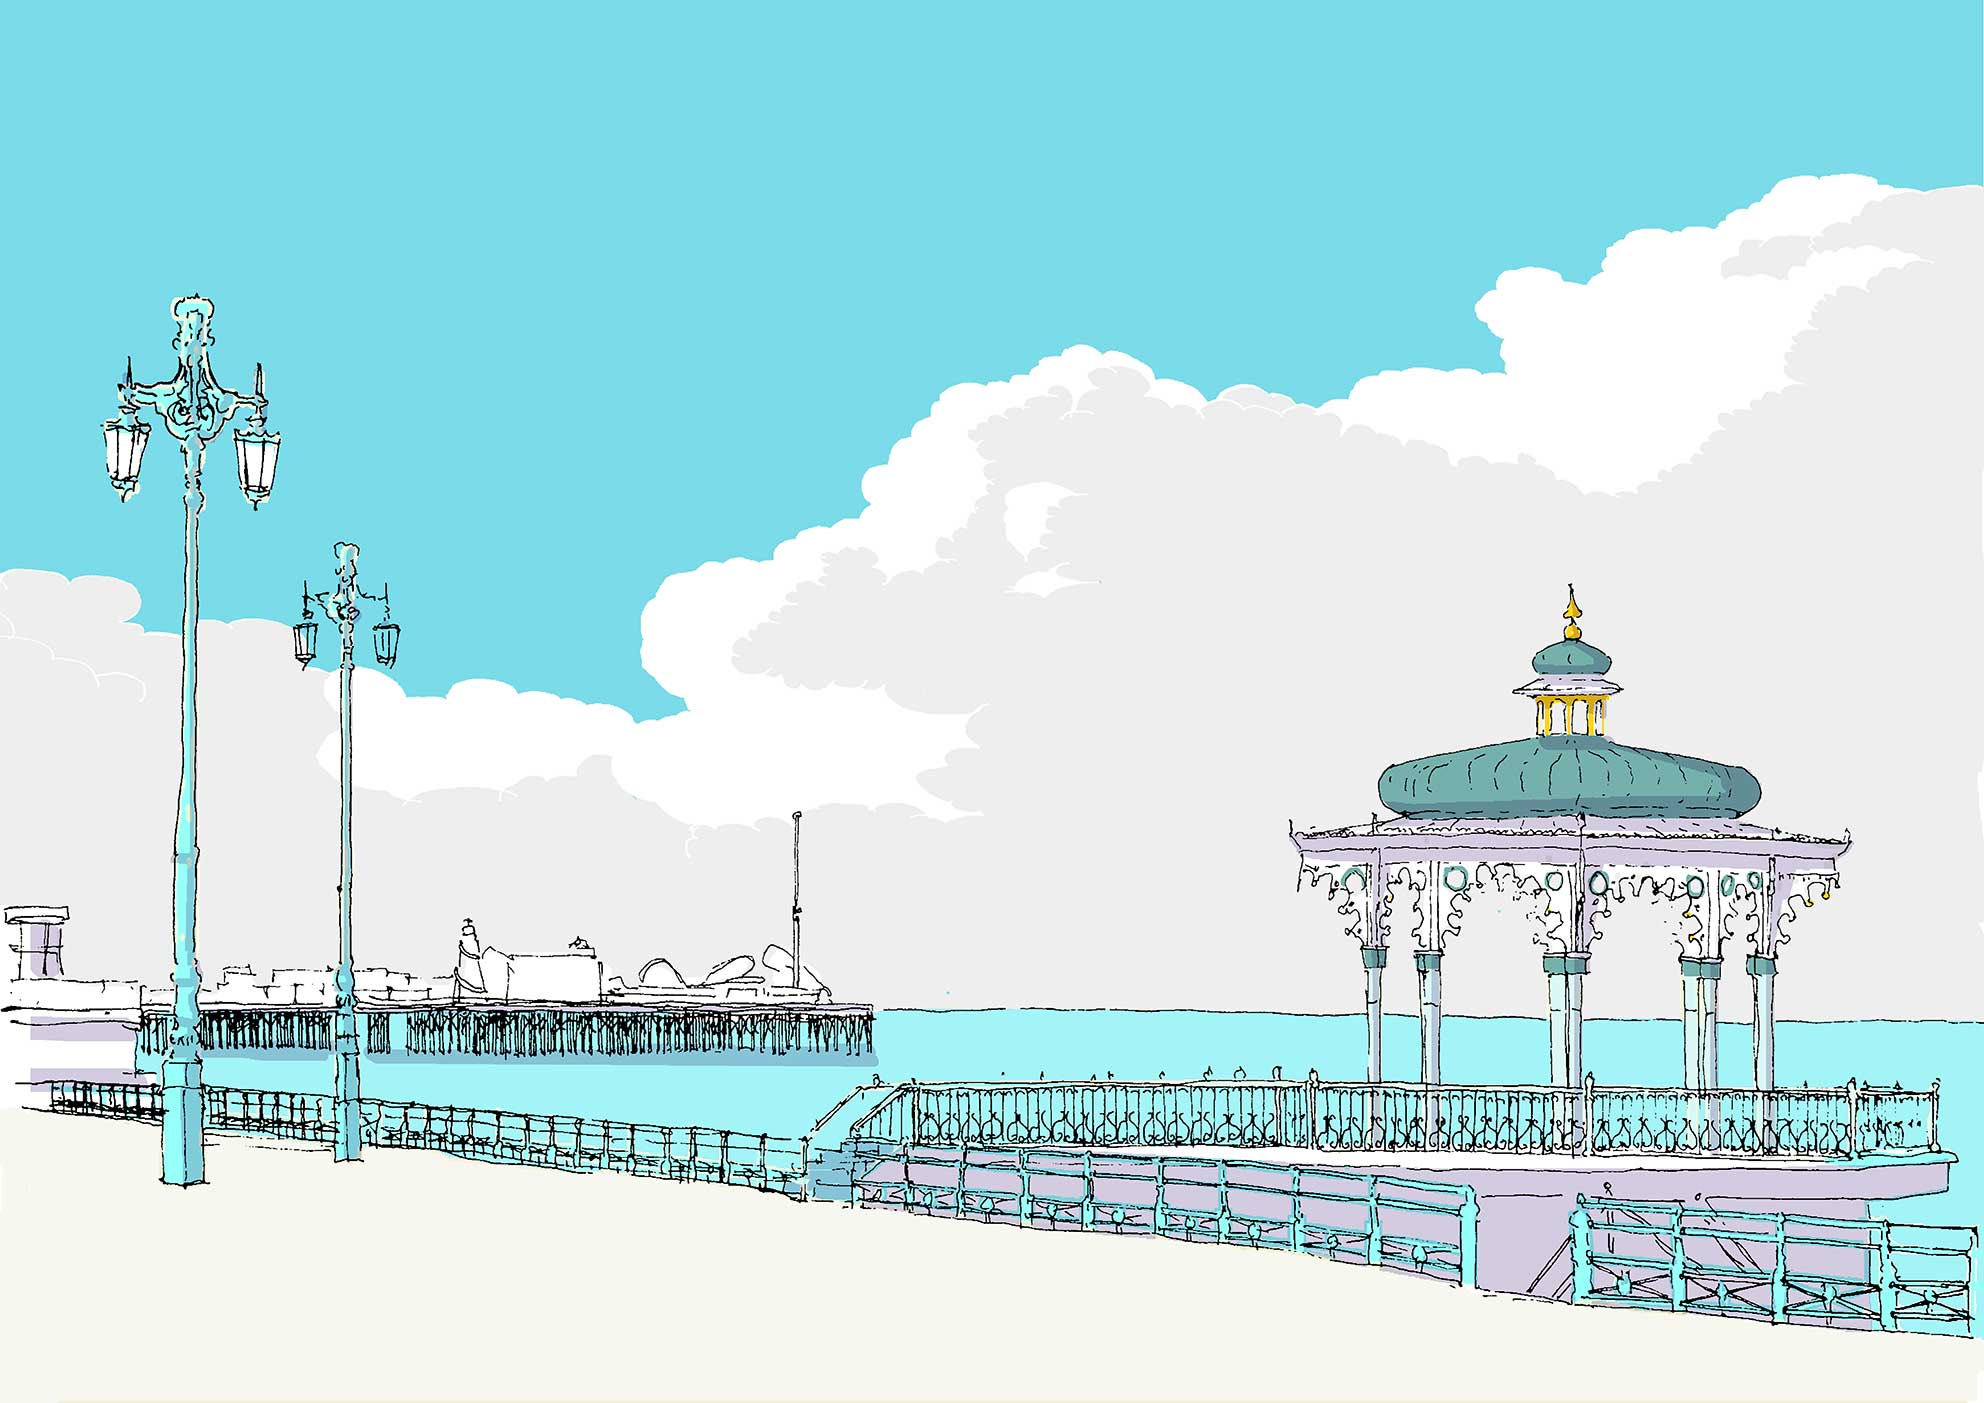 alej ez Brighton Band stand and pier 29.7x21